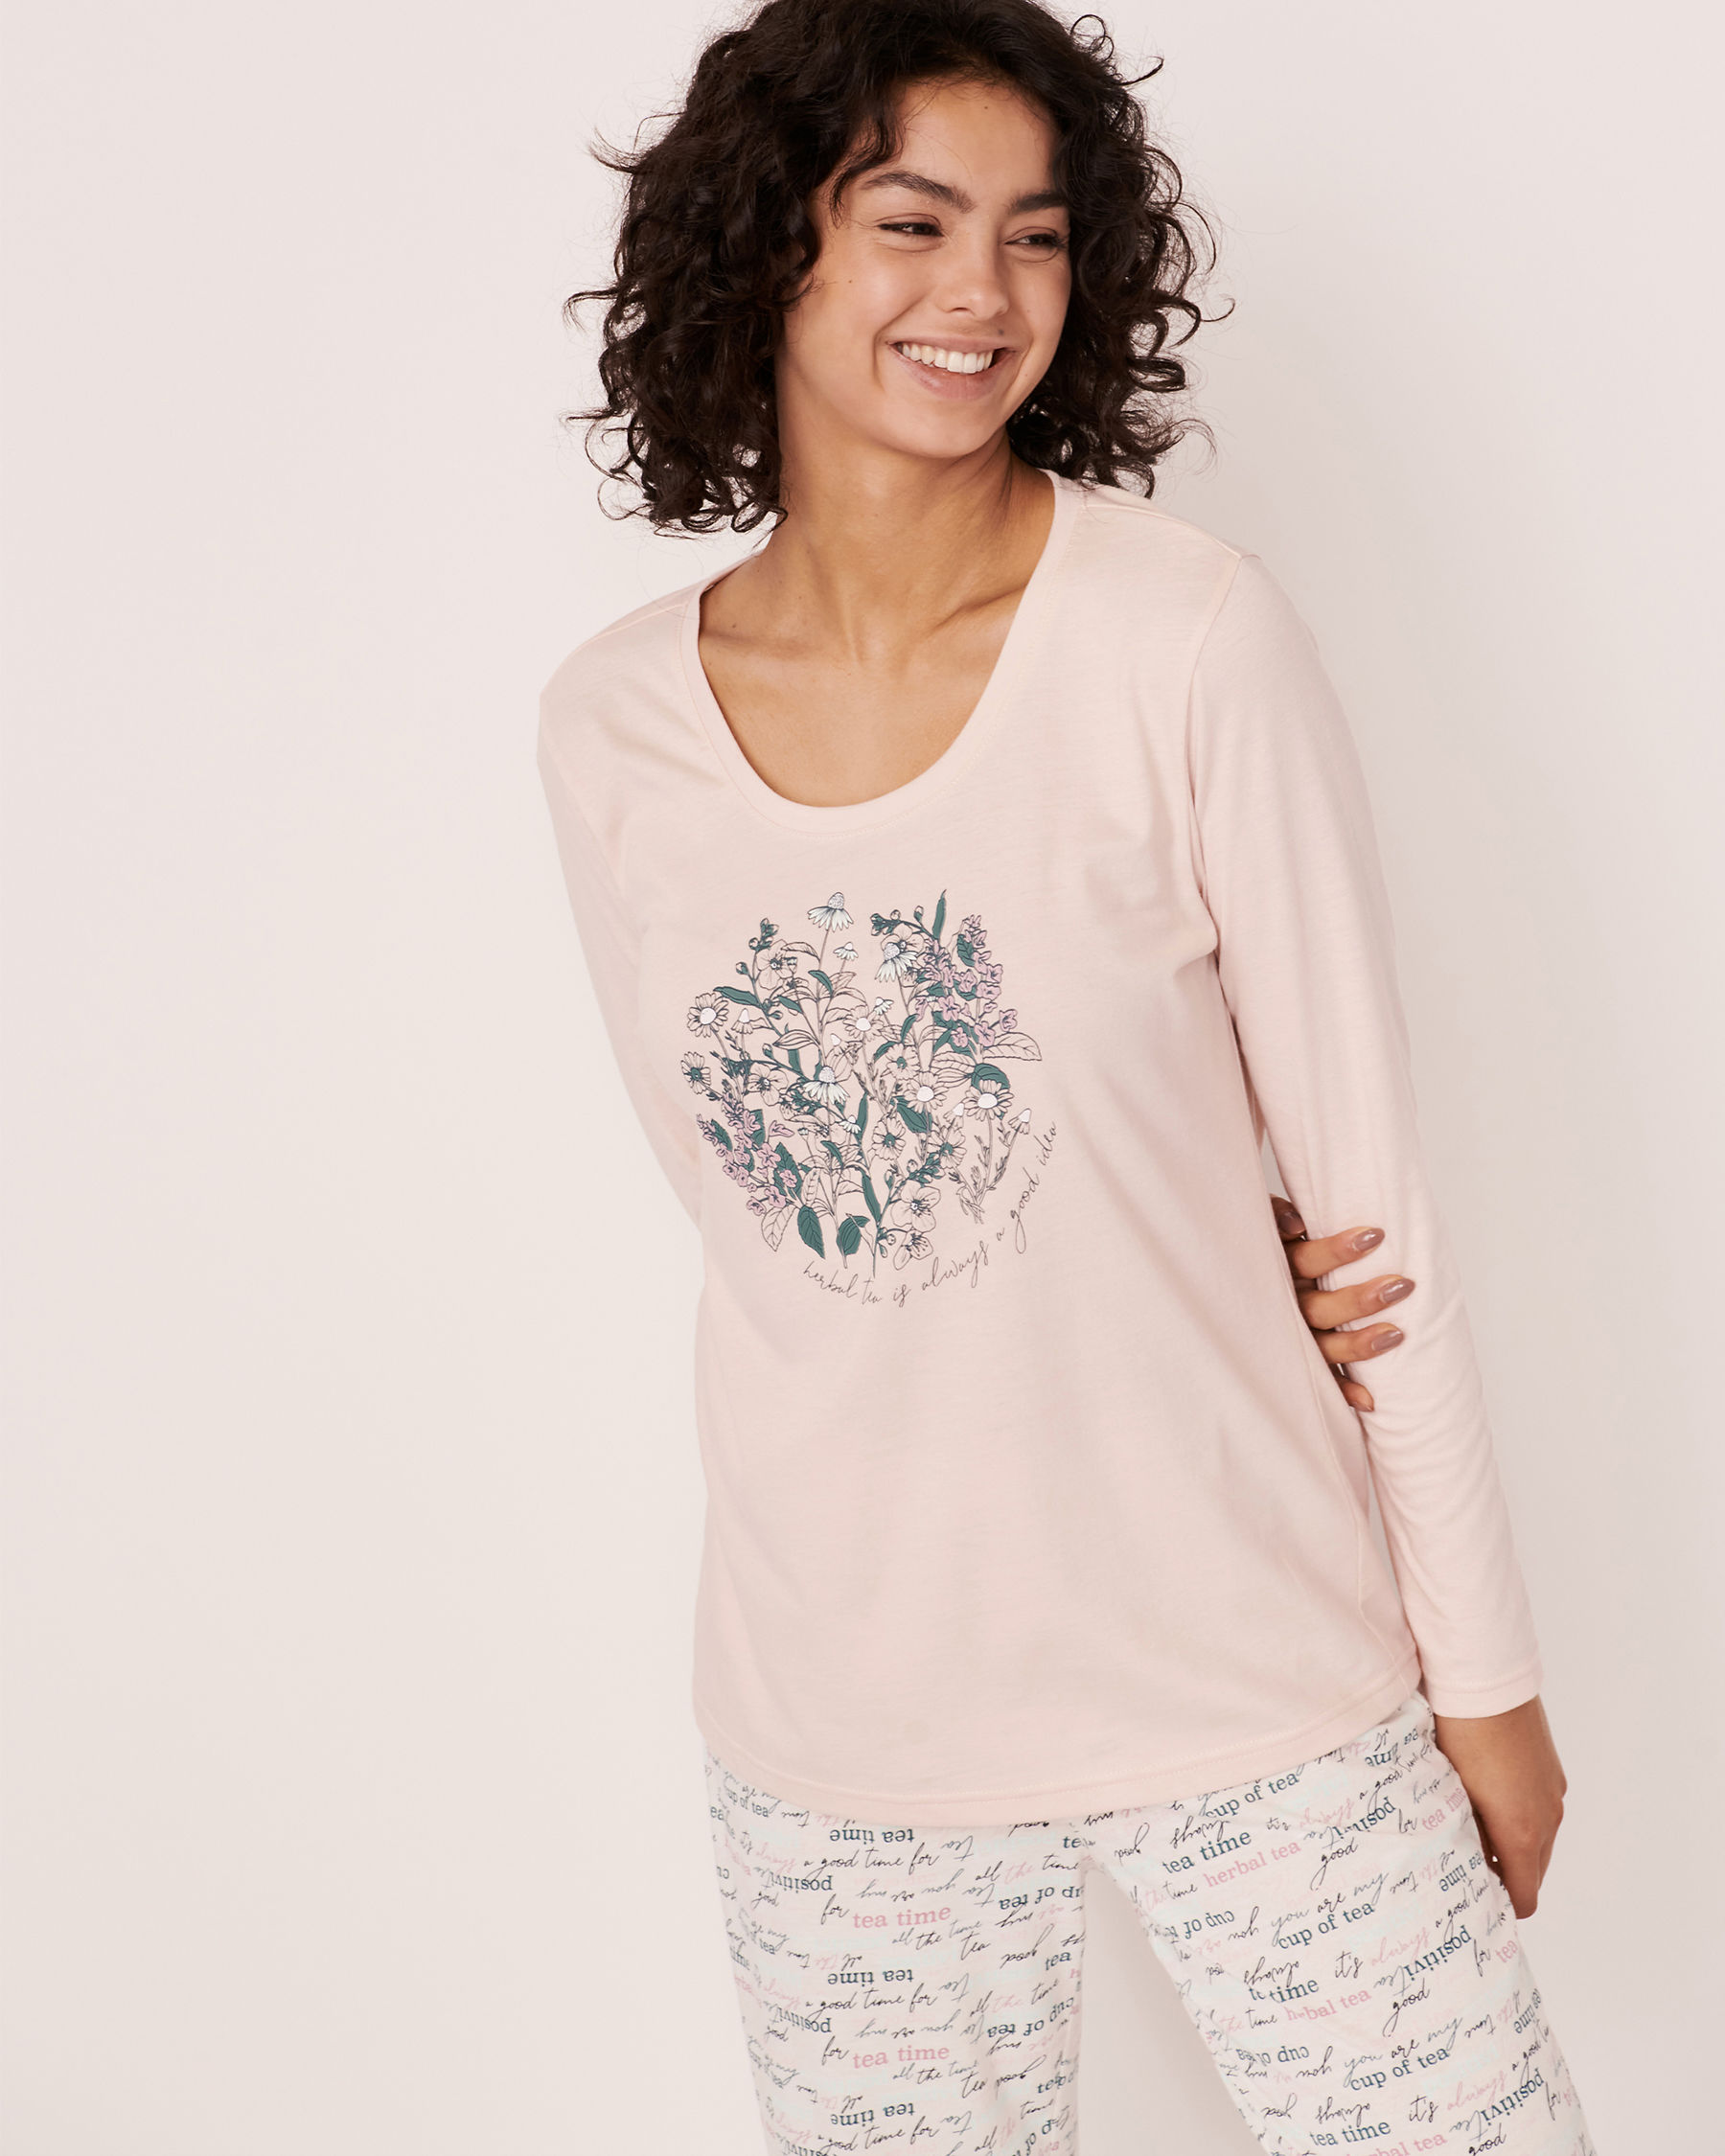 LA VIE EN ROSE Scoop Neck Long Sleeve Shirt Light pink 40100182 - View1